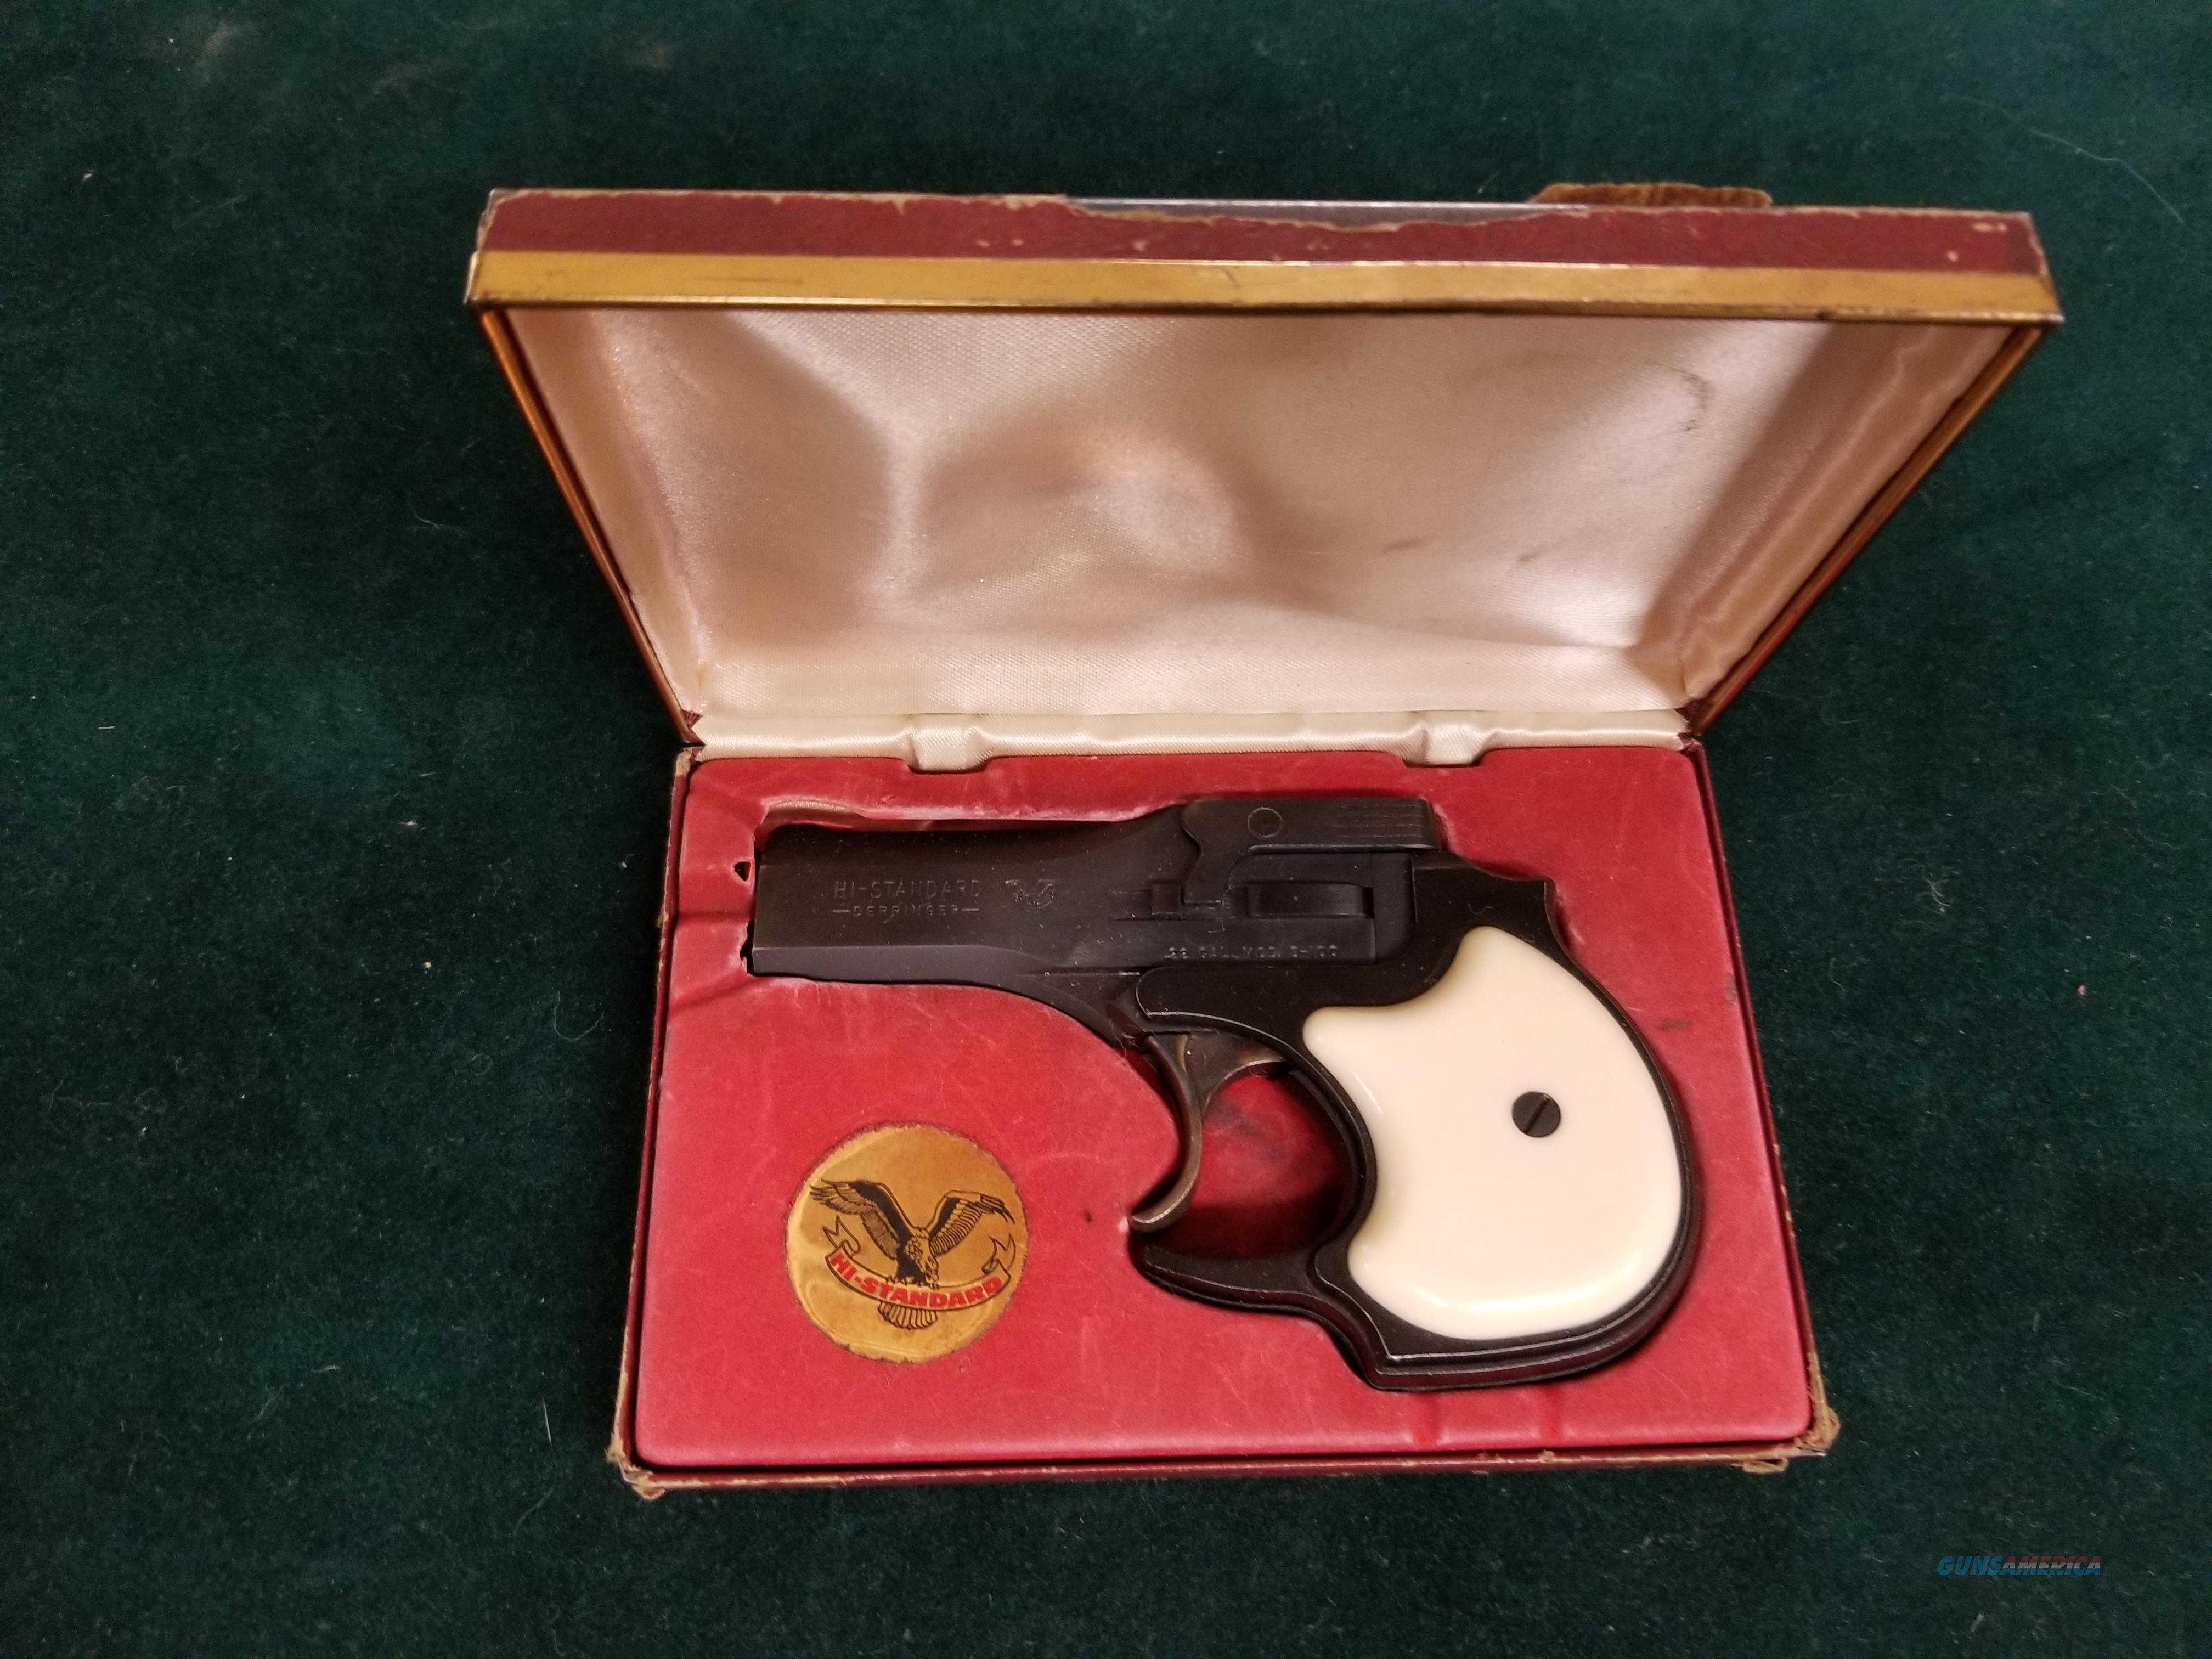 High Standard derringer  Guns > Pistols > High Standard Pistols